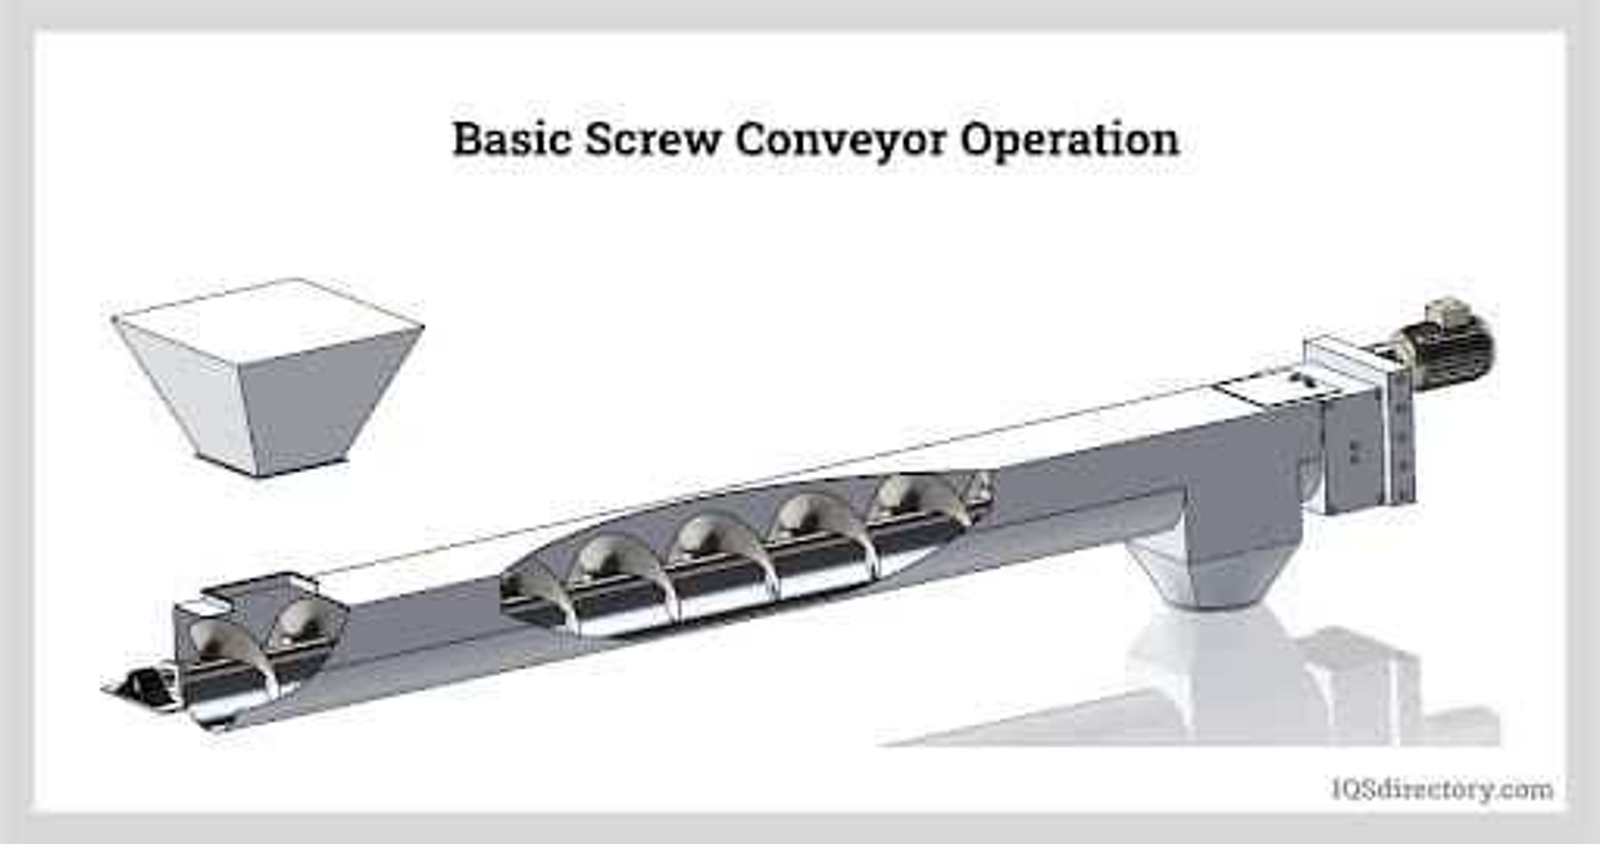 Basic Screw Conveyor Operation